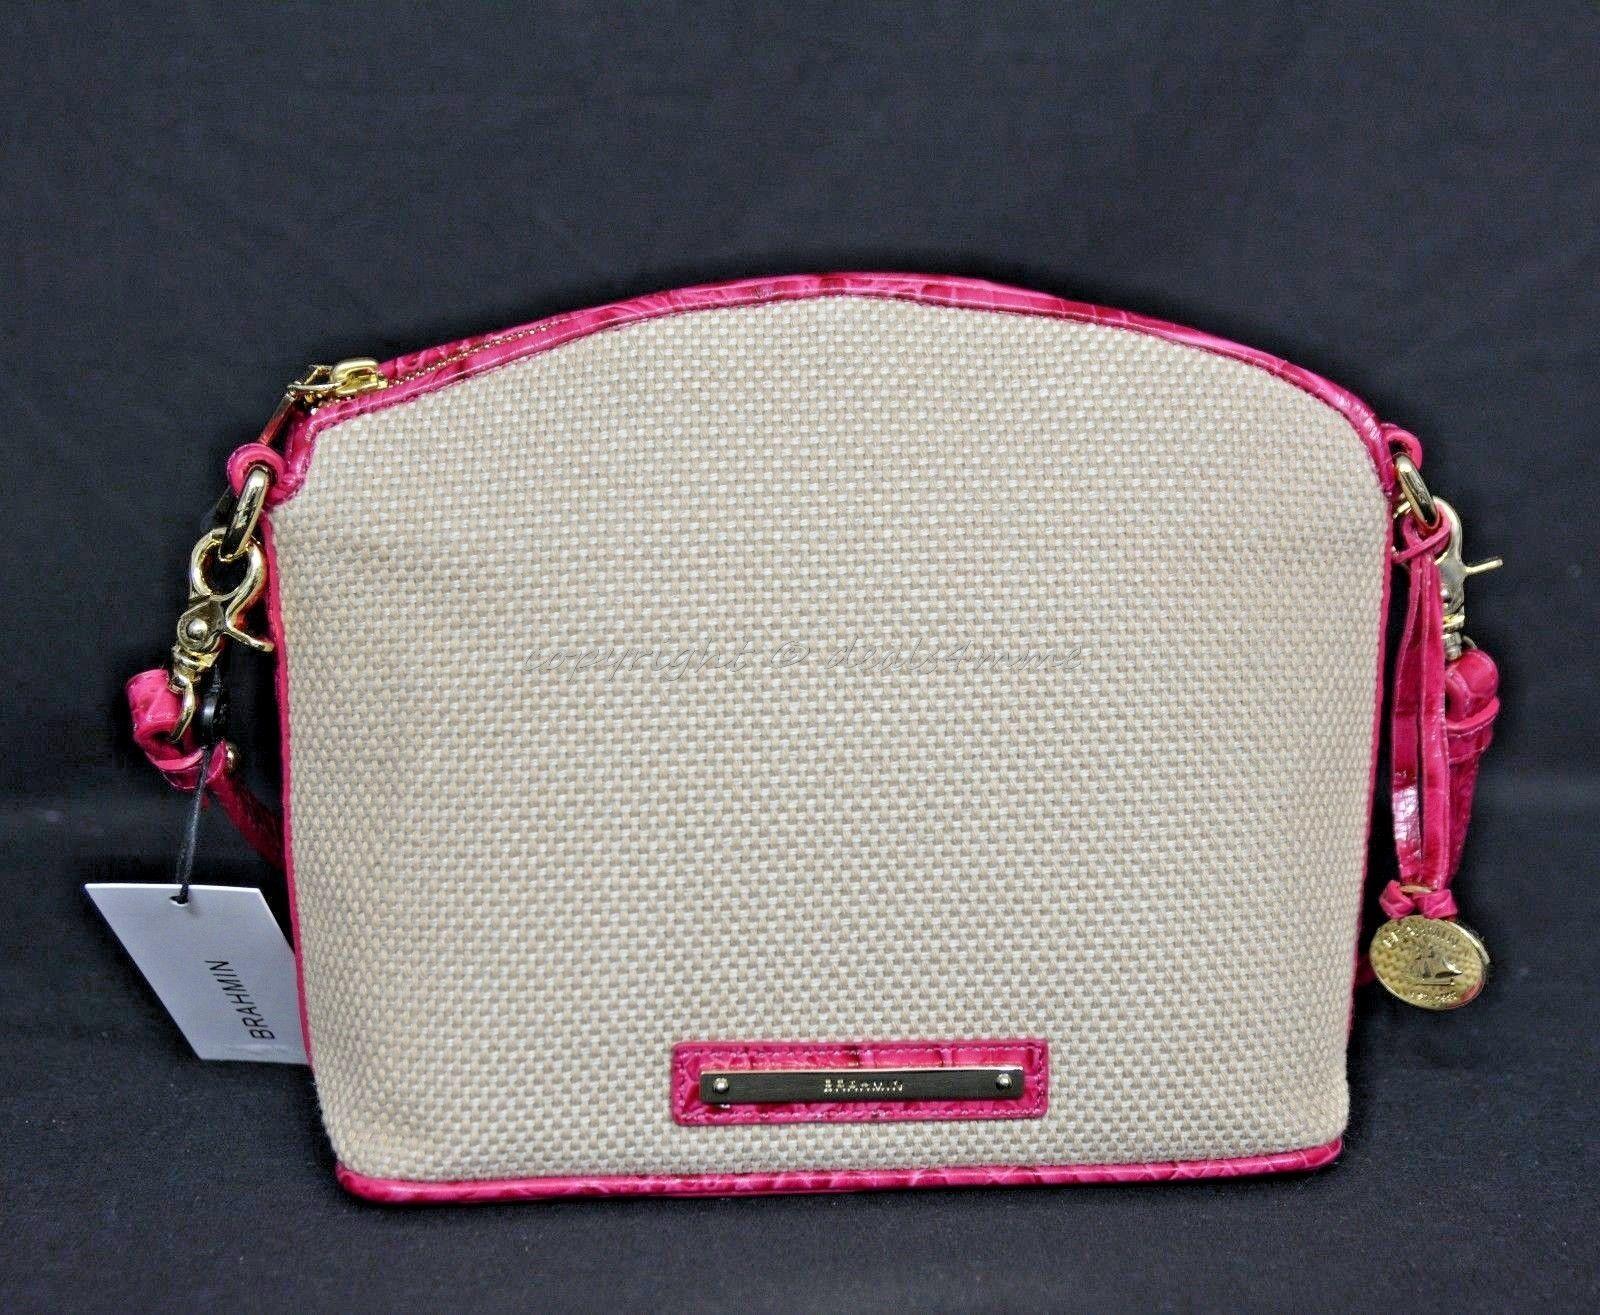 NWT Brahmin Mini Duxbury Shoulder Bag in Punch Harbor, Pink Leather/Beige Fabric image 7